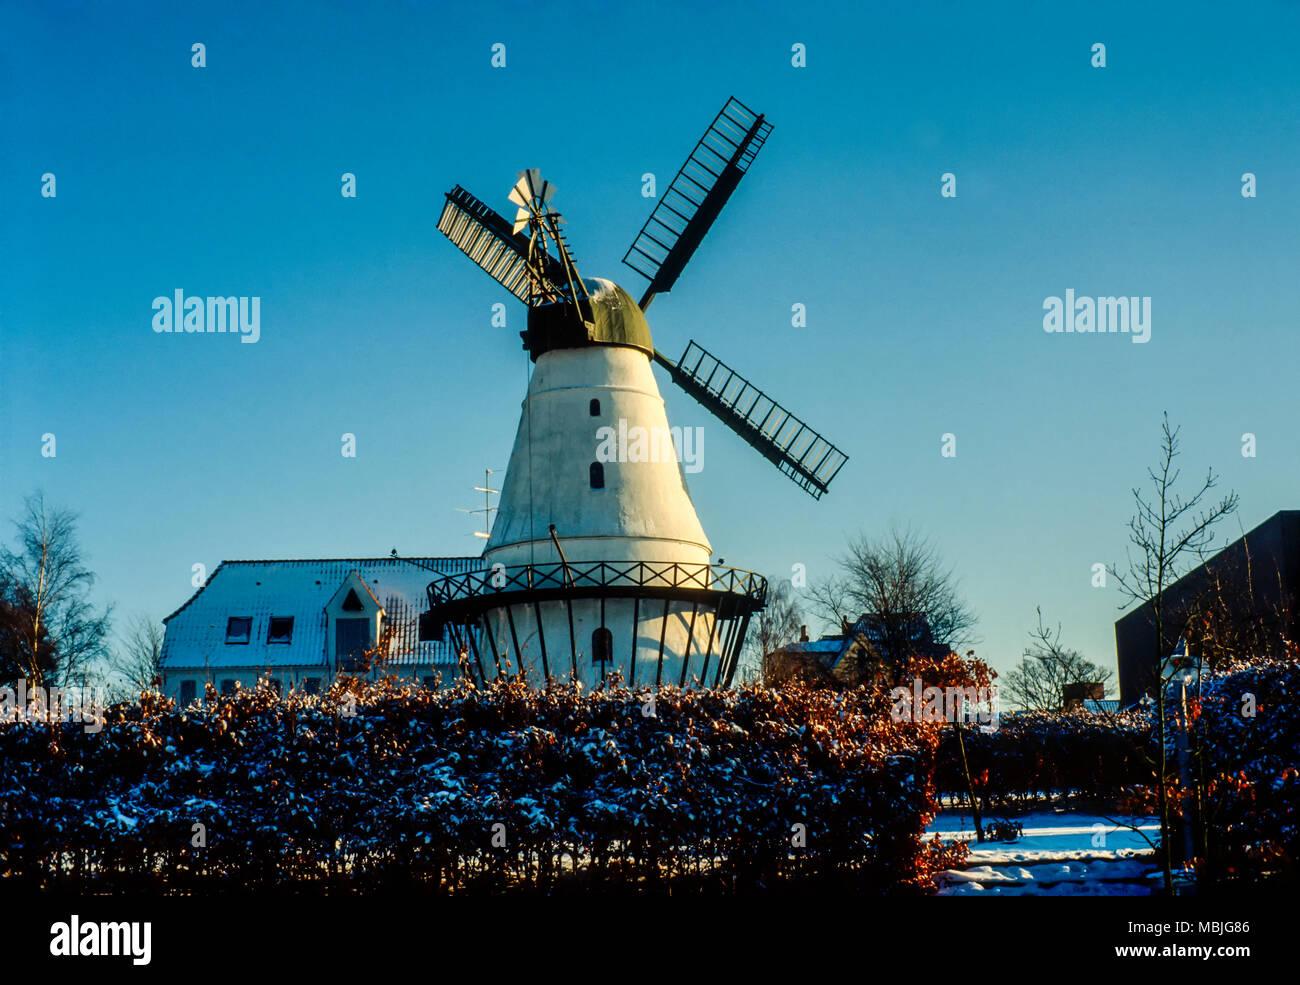 Historic windmill in Dybboel, Jylland, Denmark. - Stock Image